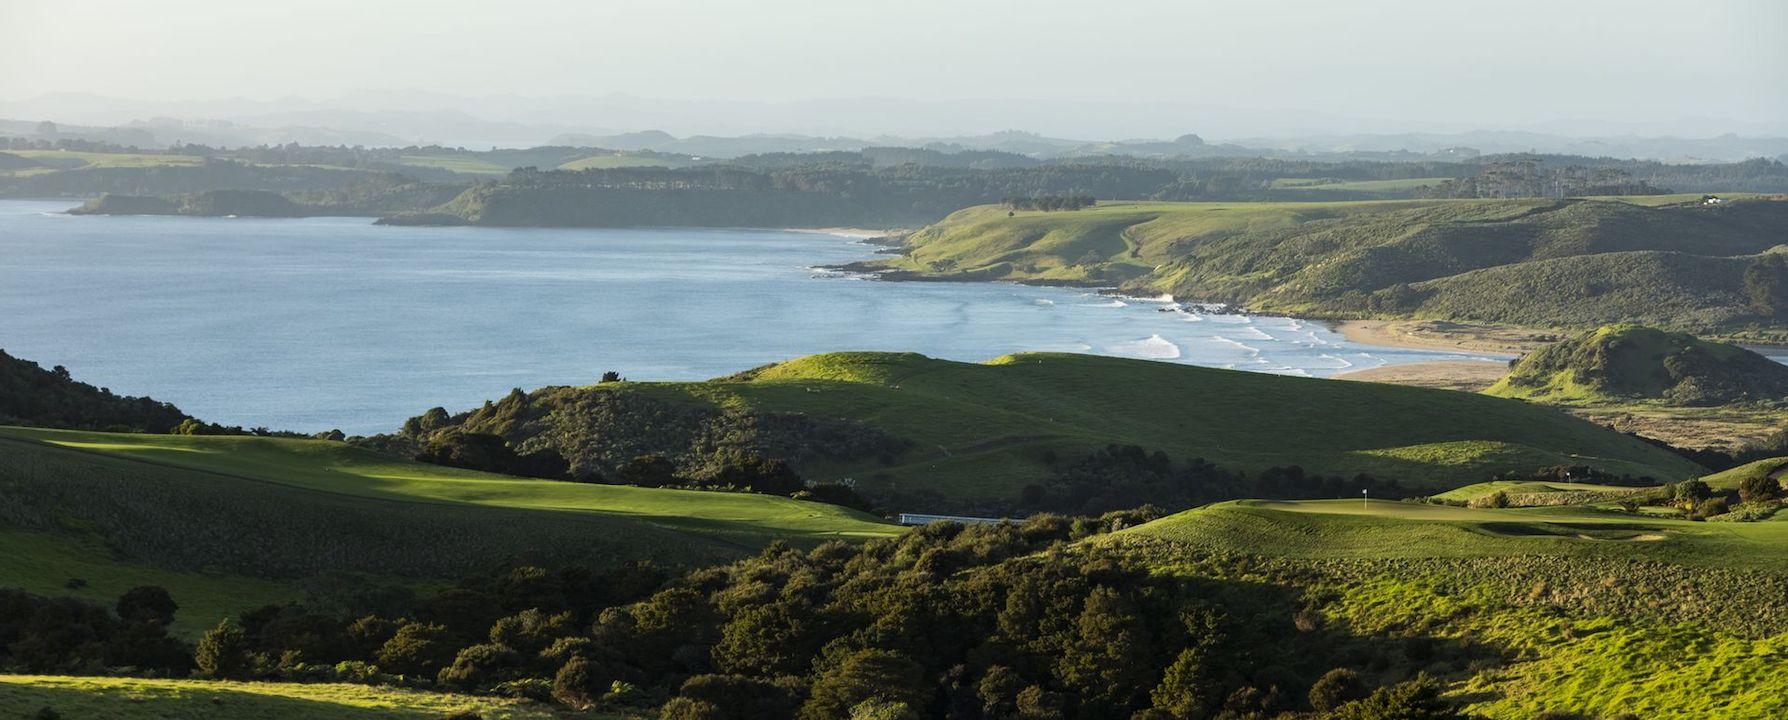 Robertson luxurious Lodges Kauri Cliffs , Matauri Bay Northland / New Zealand